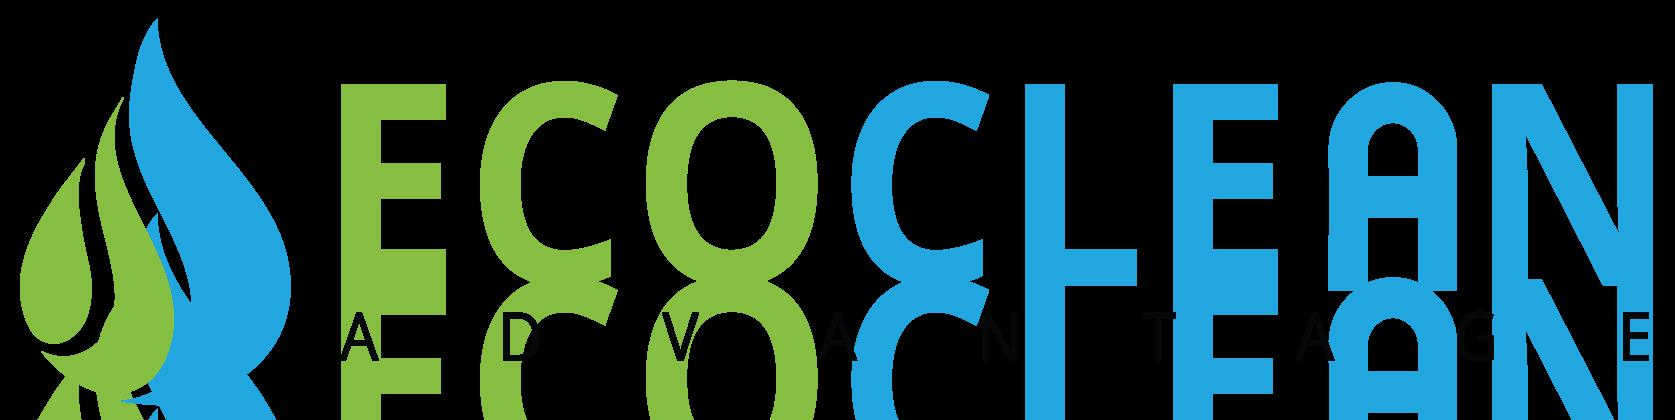 EcoClean Edvantage